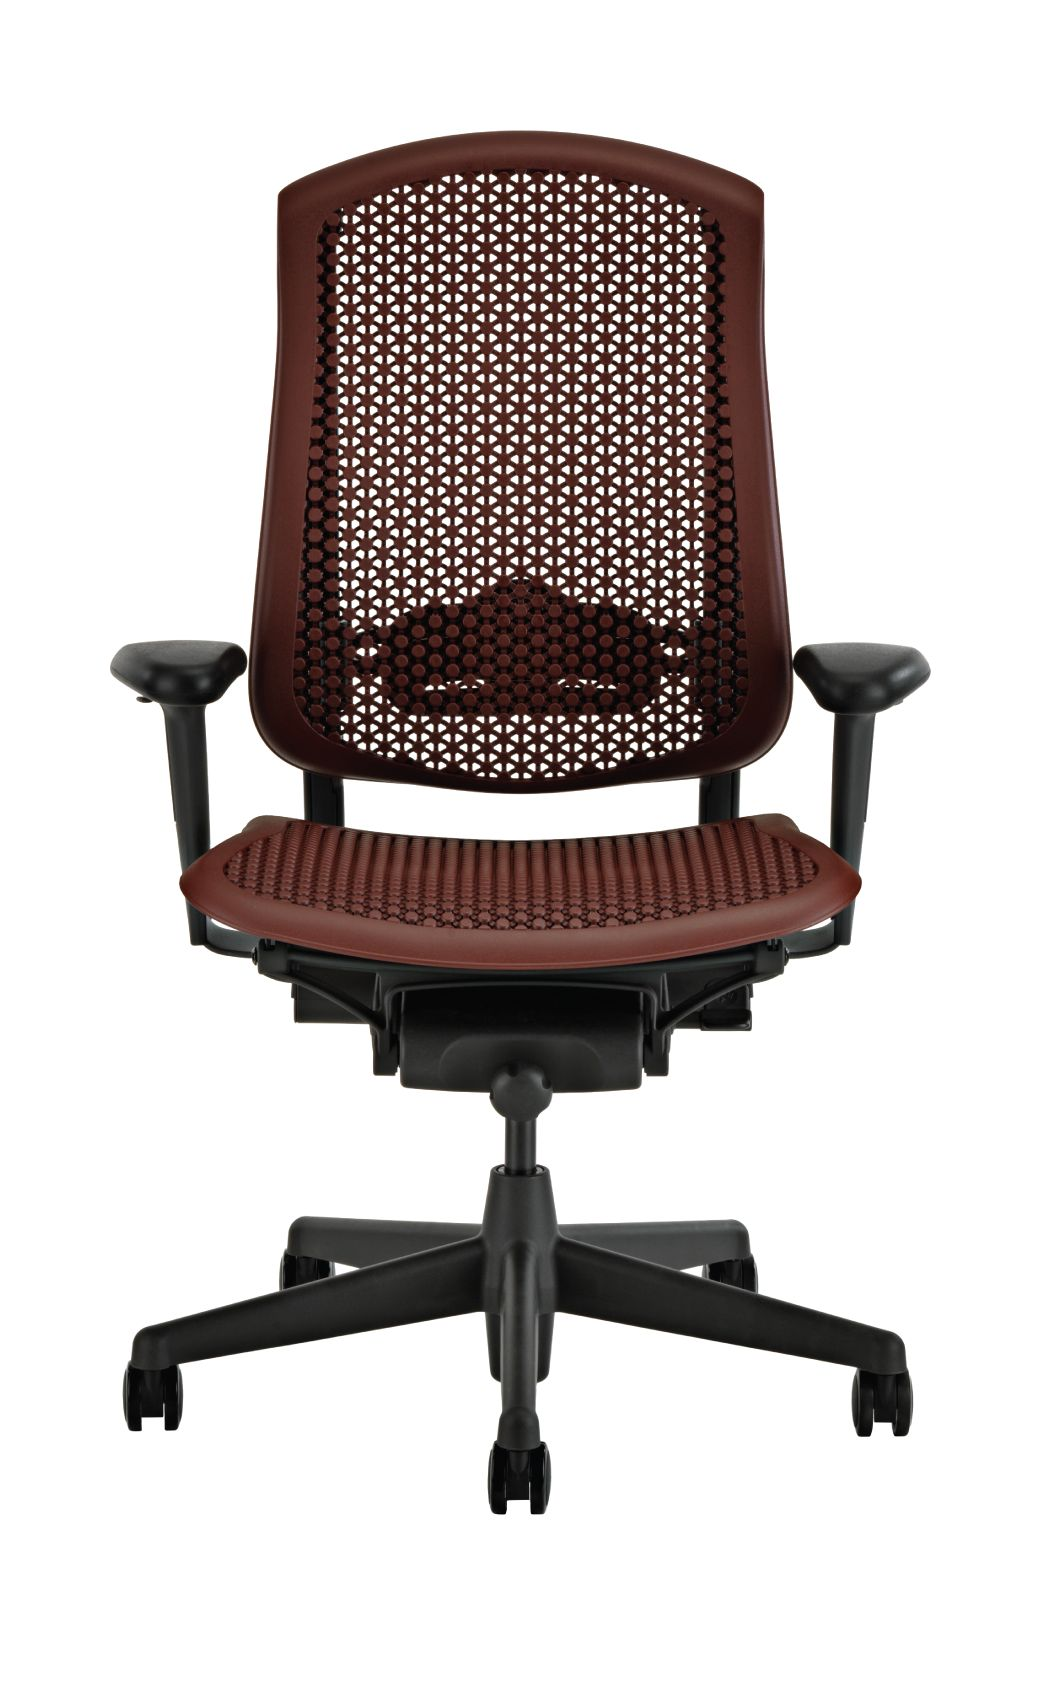 ergonomic chair miller oak rocking herman celle office cabernet review